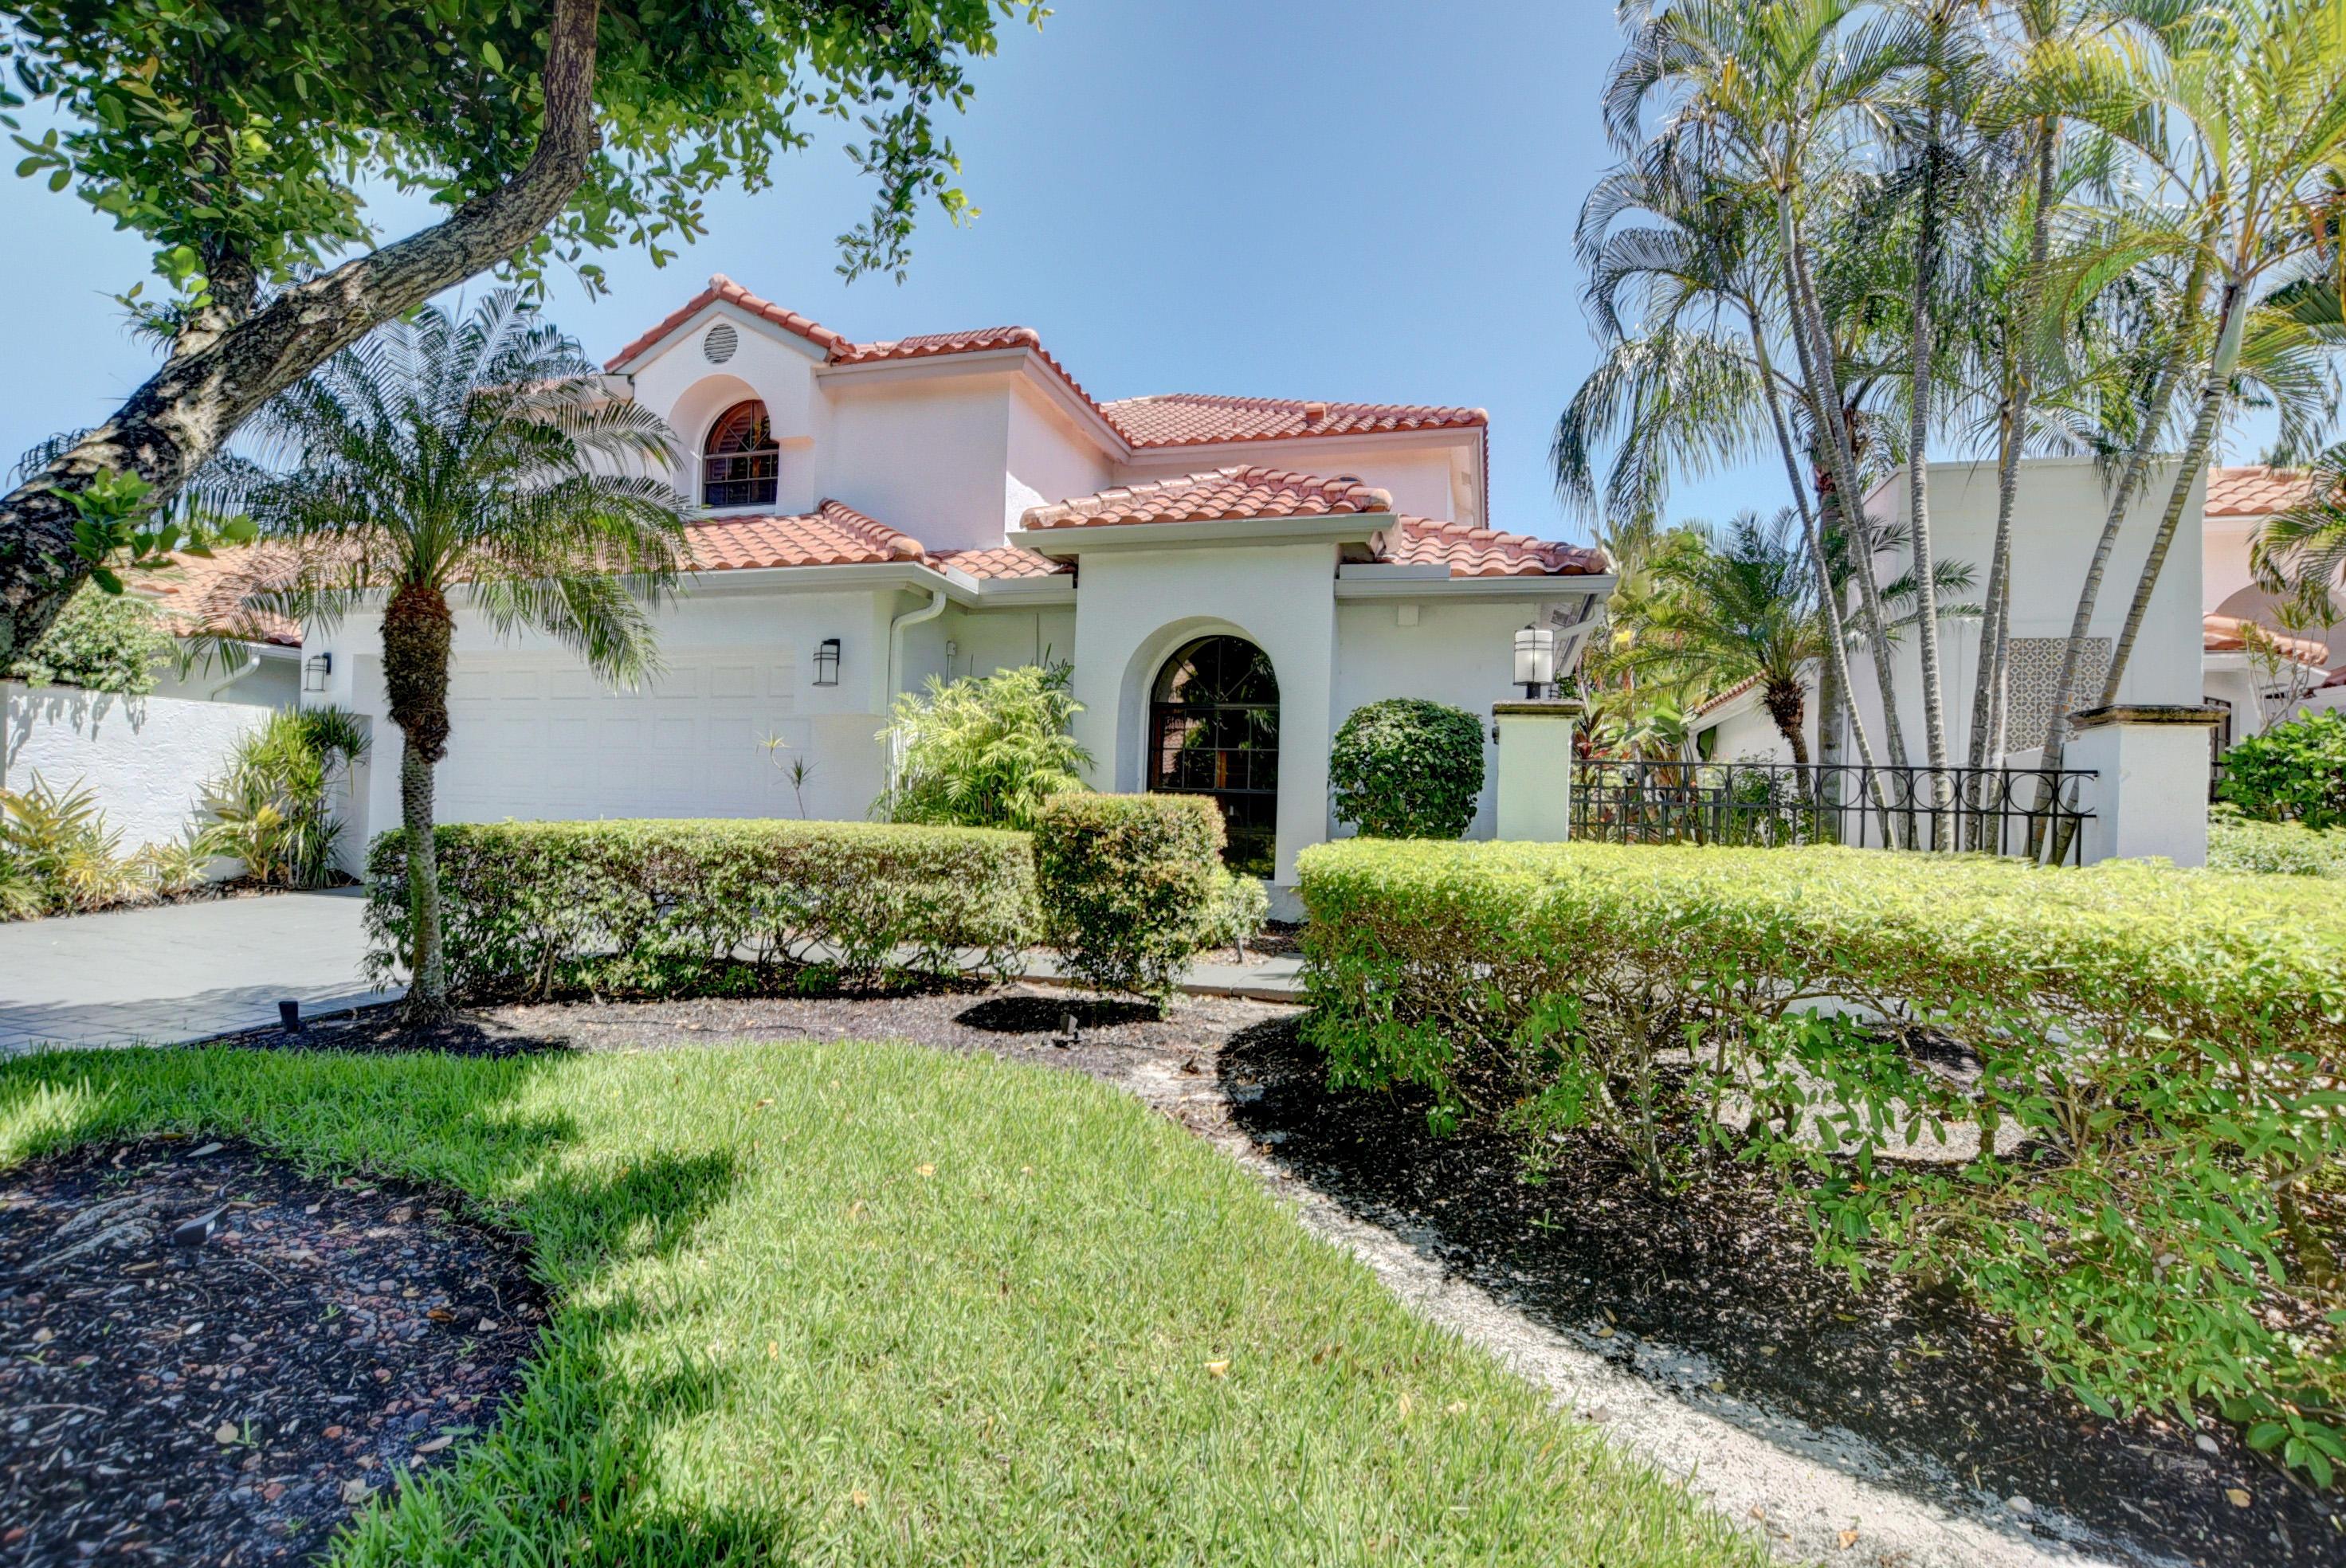 Photo of 5862 NW 21st Avenue, Boca Raton, FL 33496